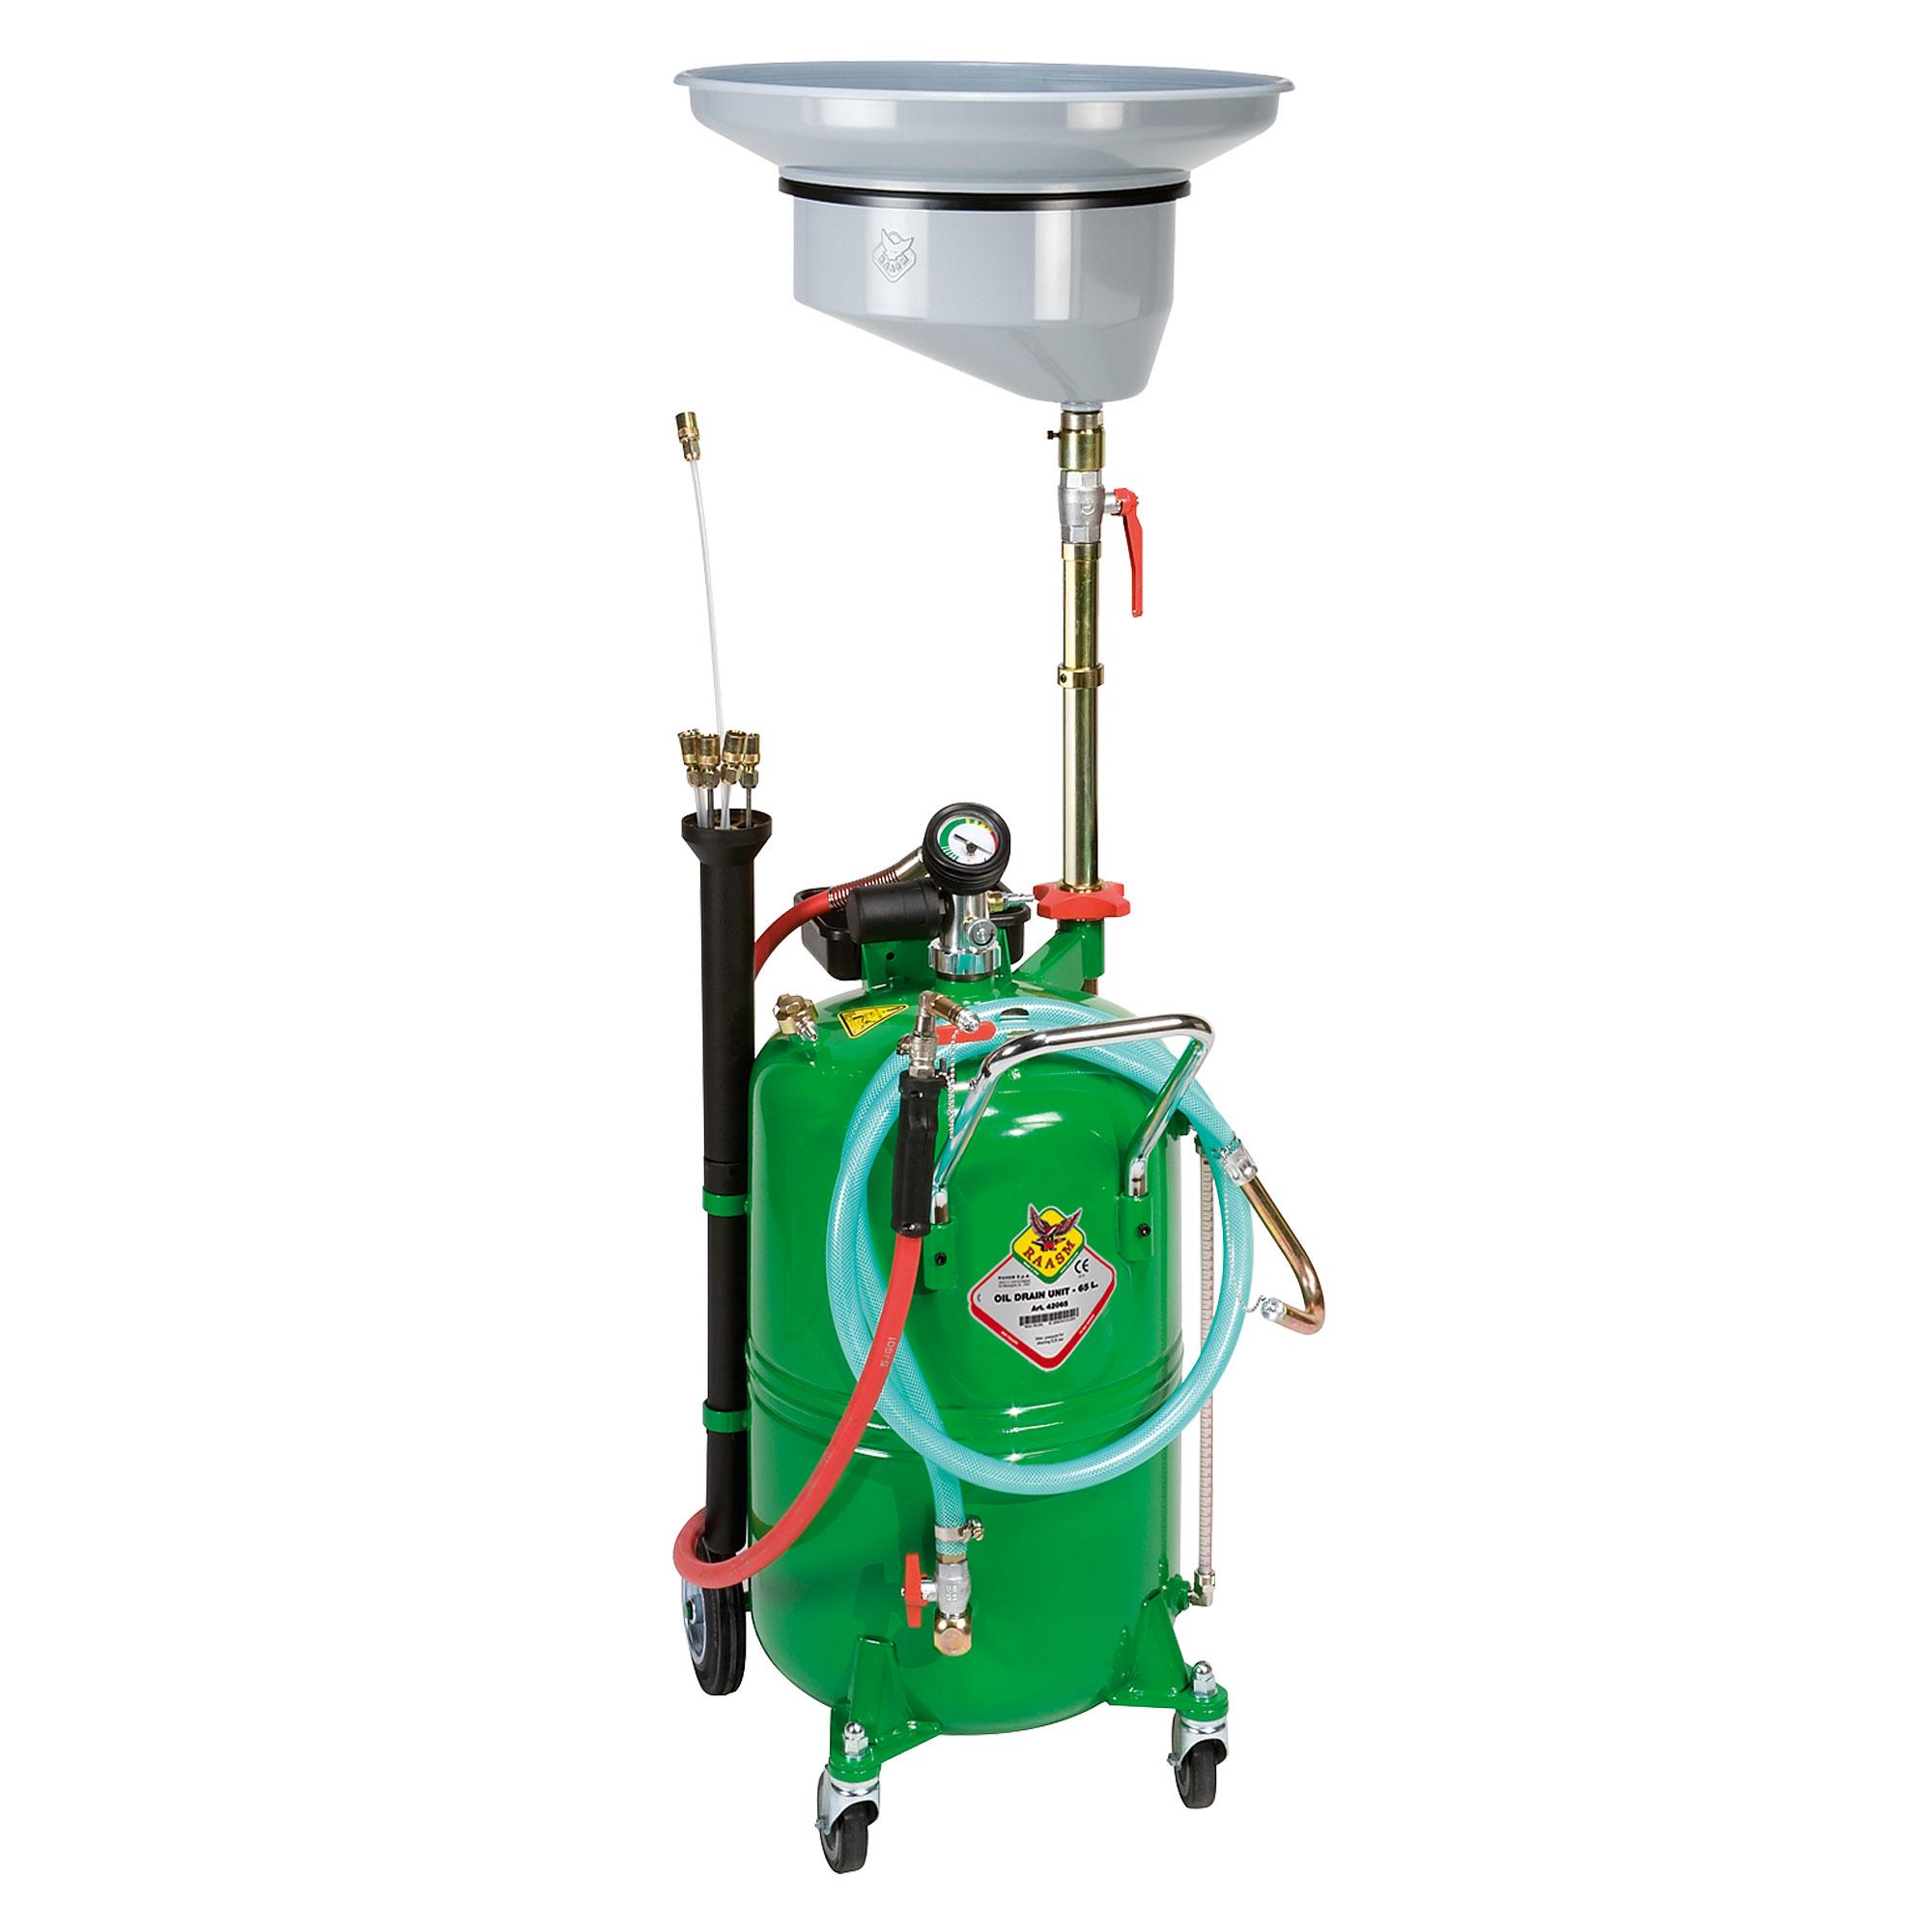 44090 - 90L Mobile Combination Oil Evacuator/Drainer